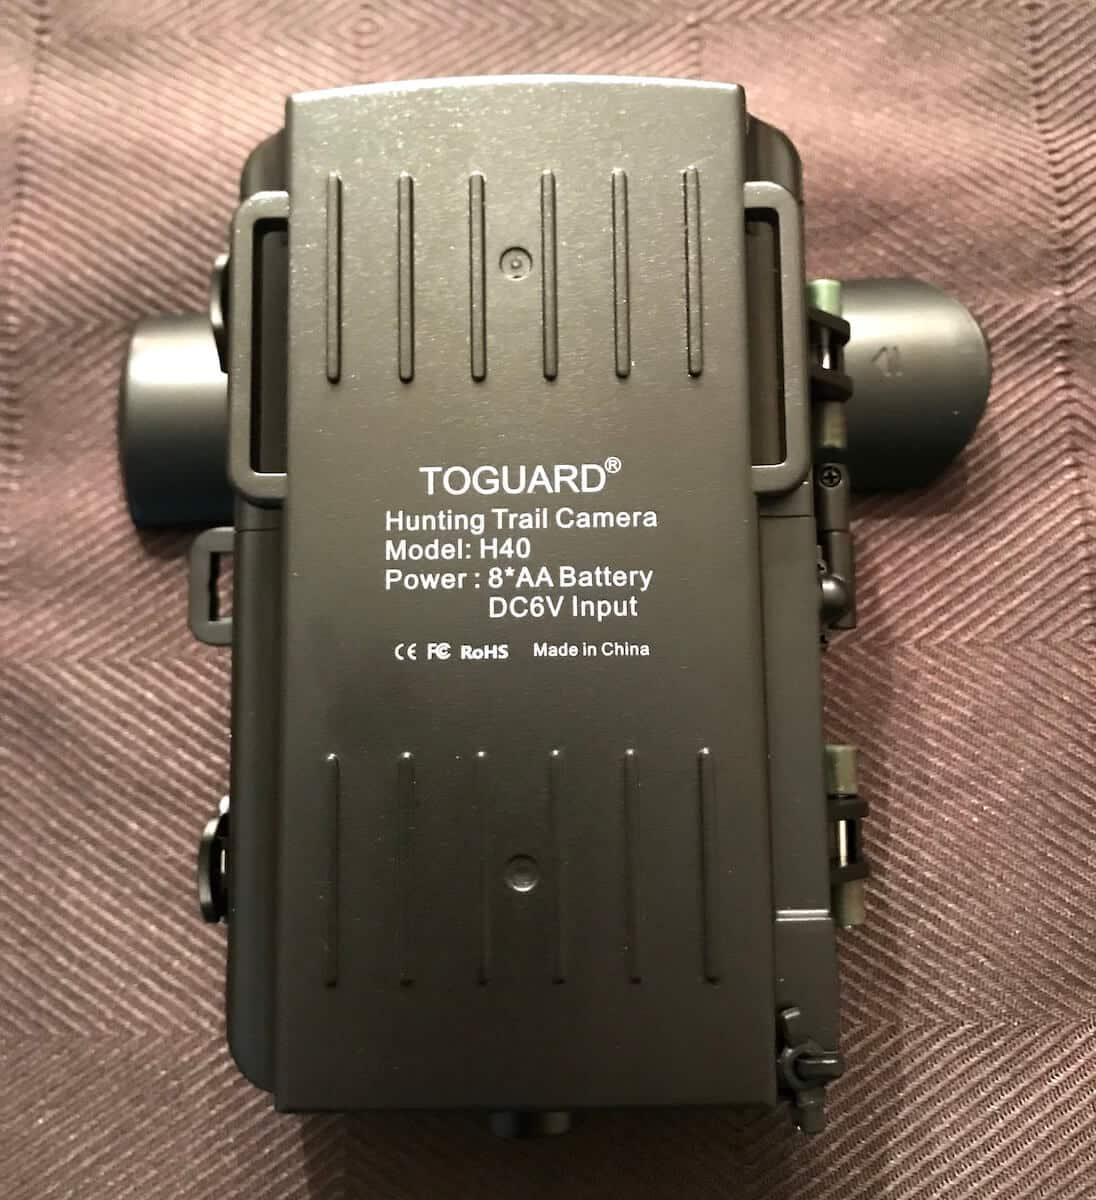 Toguard H40 Digital Wildlife Camera Back